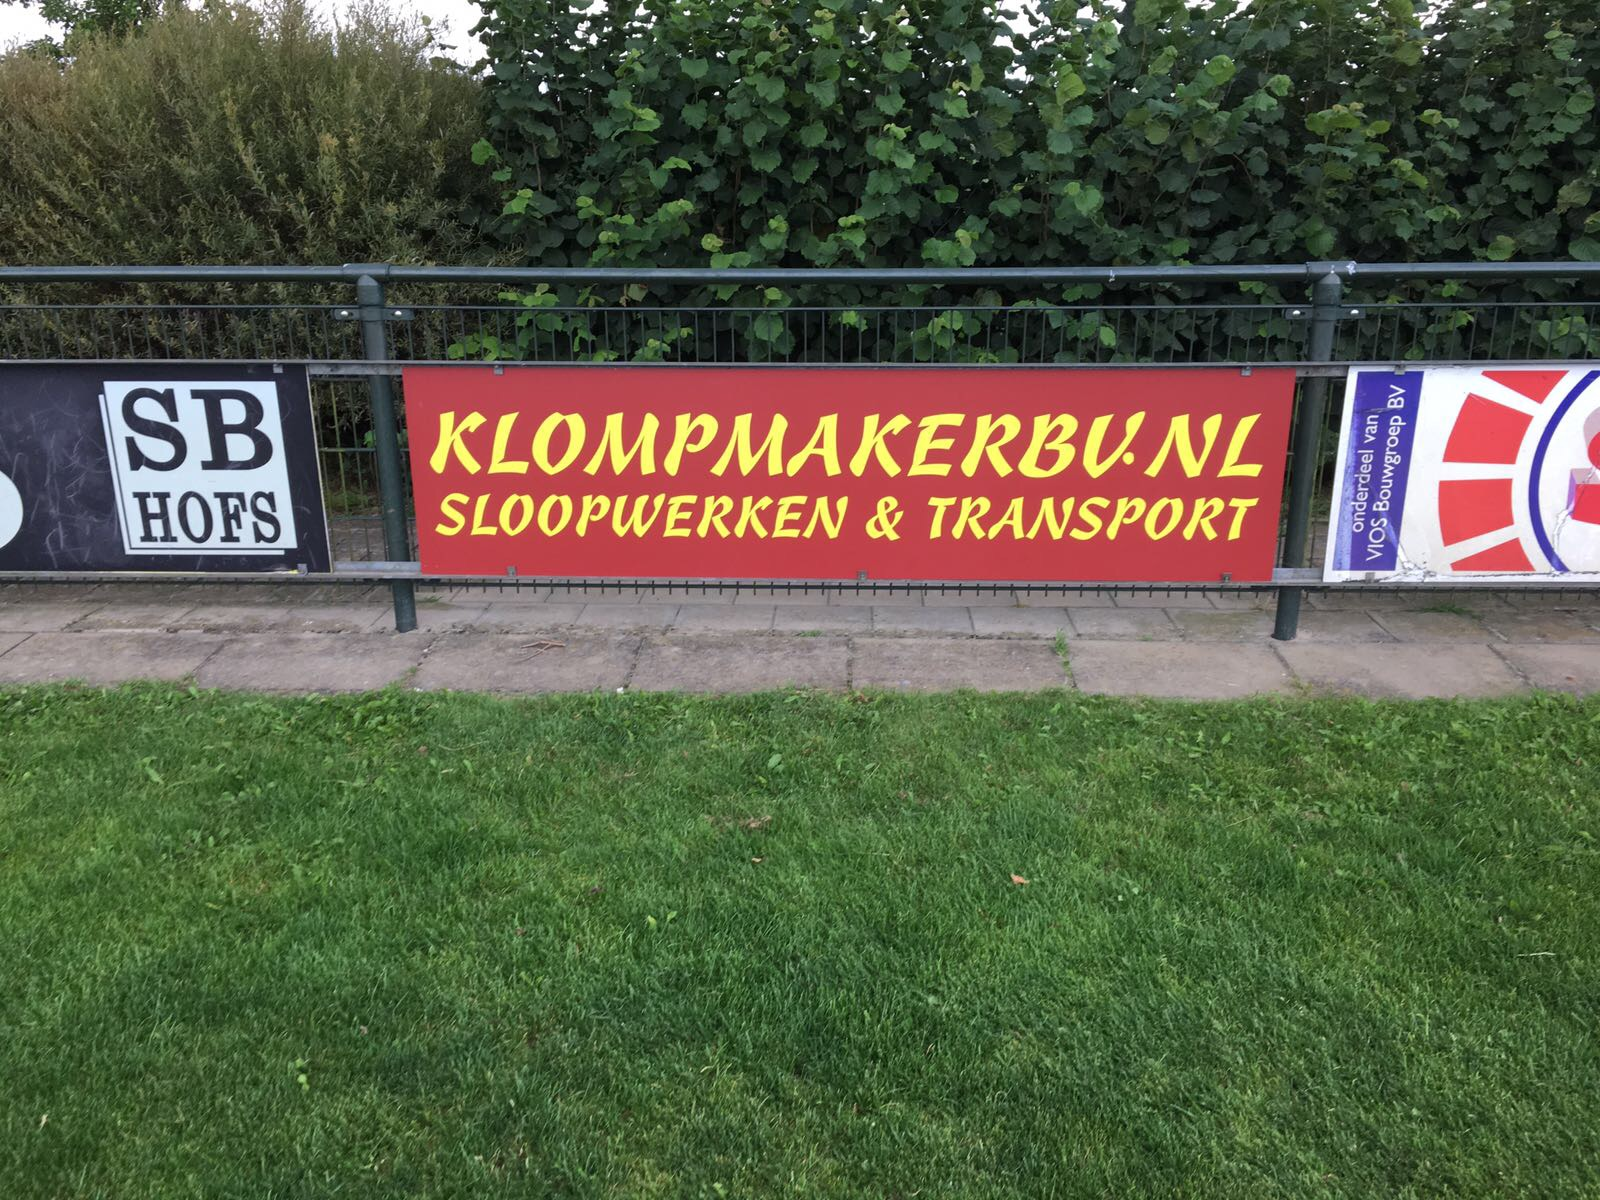 Contractnieuws nieuwe borgsponsor Klompmaker B.V.